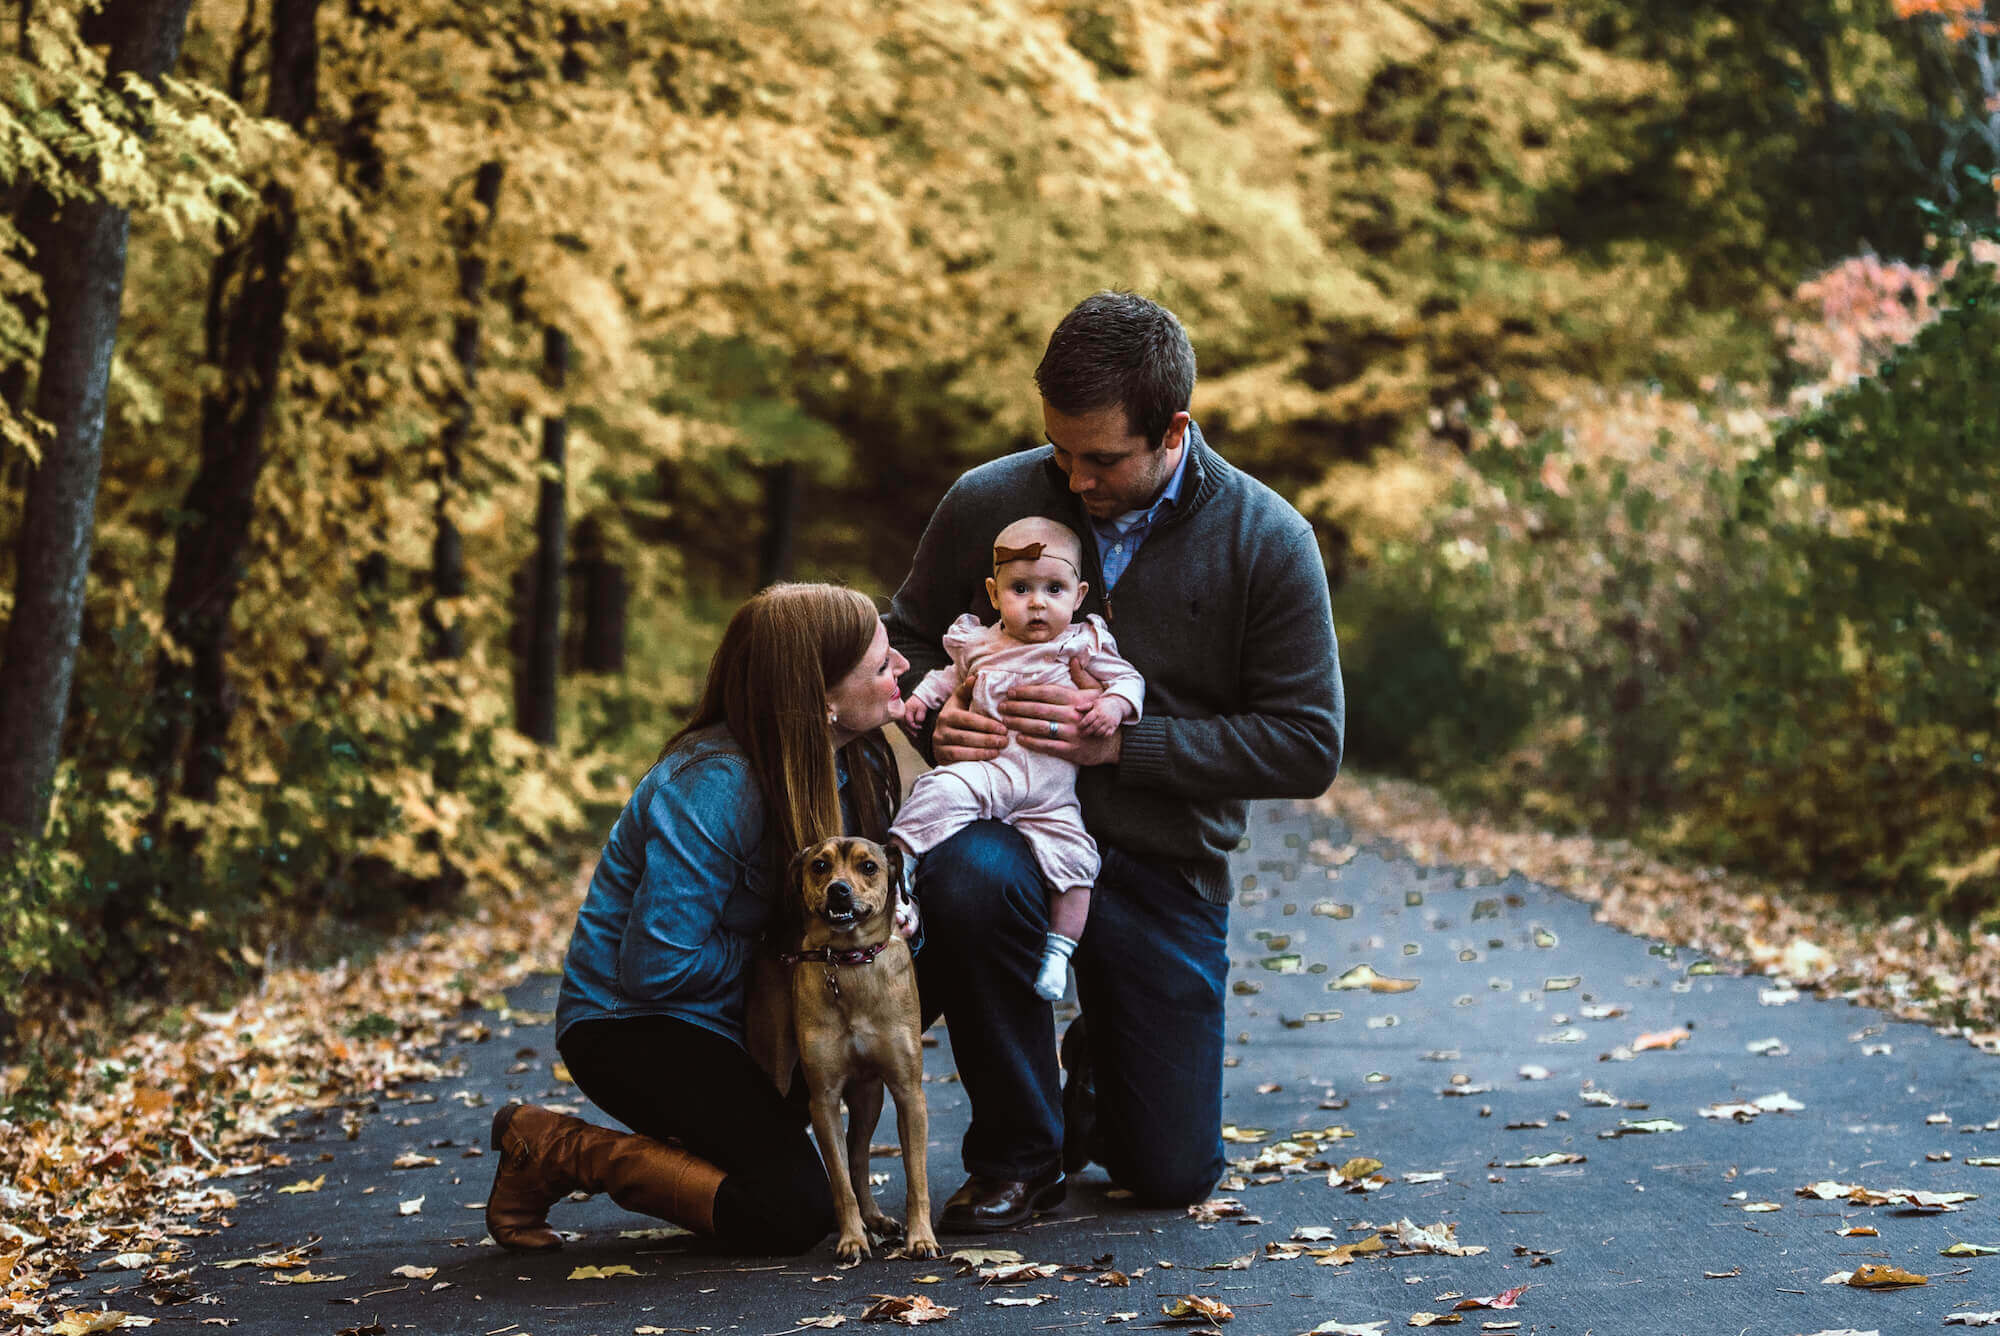 engle-olson-family-photography-session-1.jpg